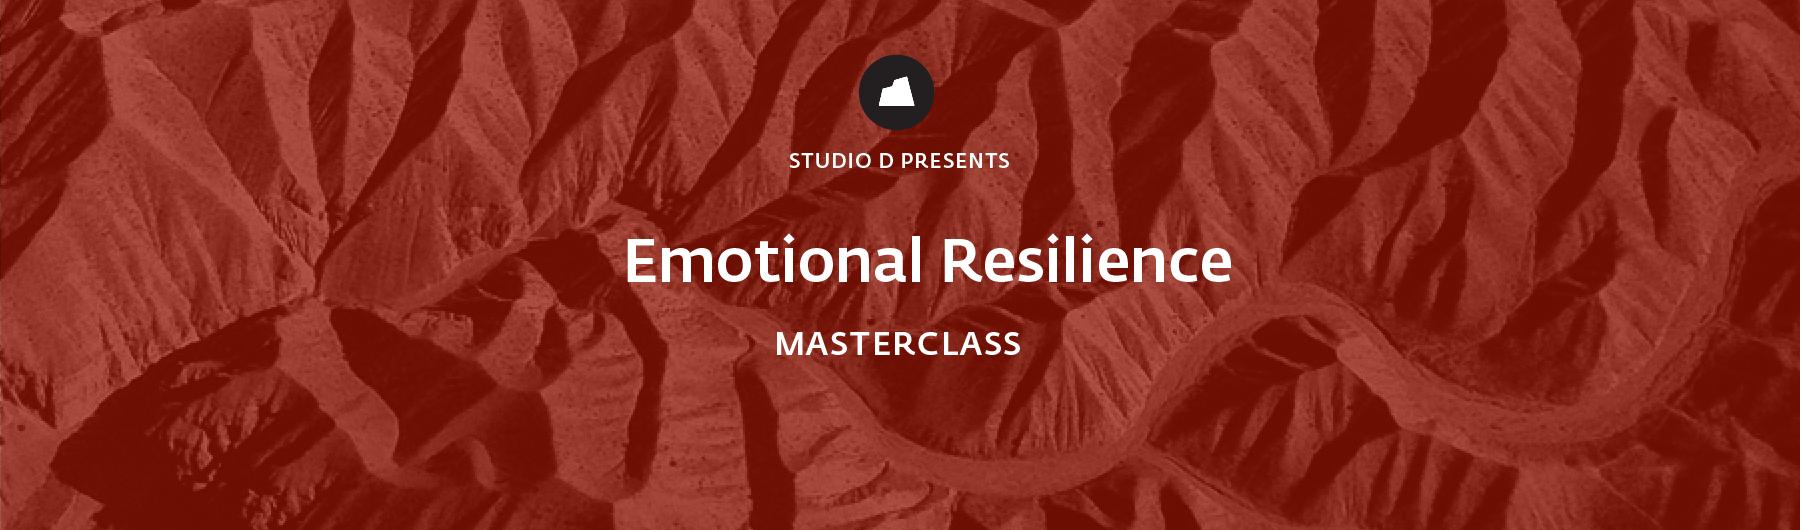 Emotional Resilience Masterclass, 22 April 2020, Singapore